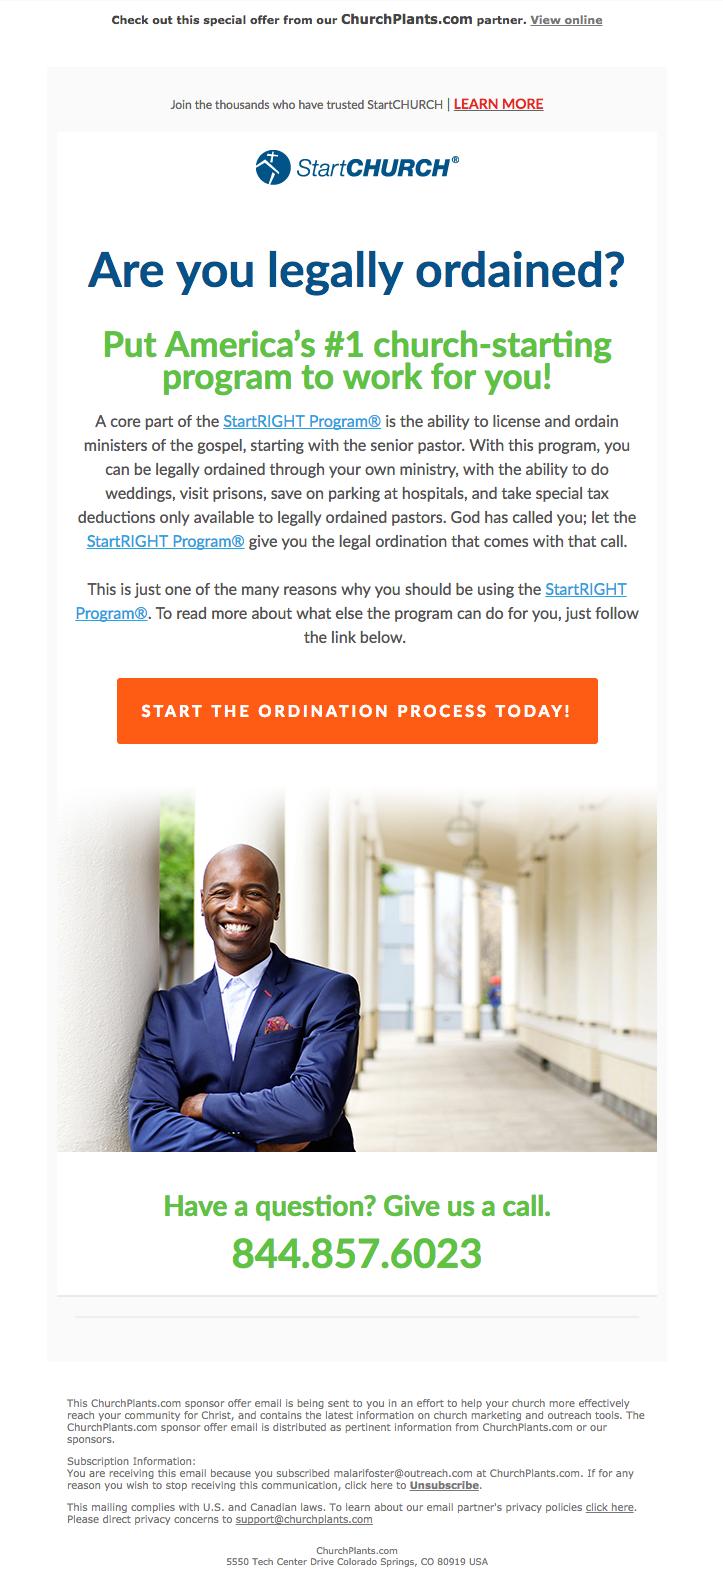 ChurchPlants Email